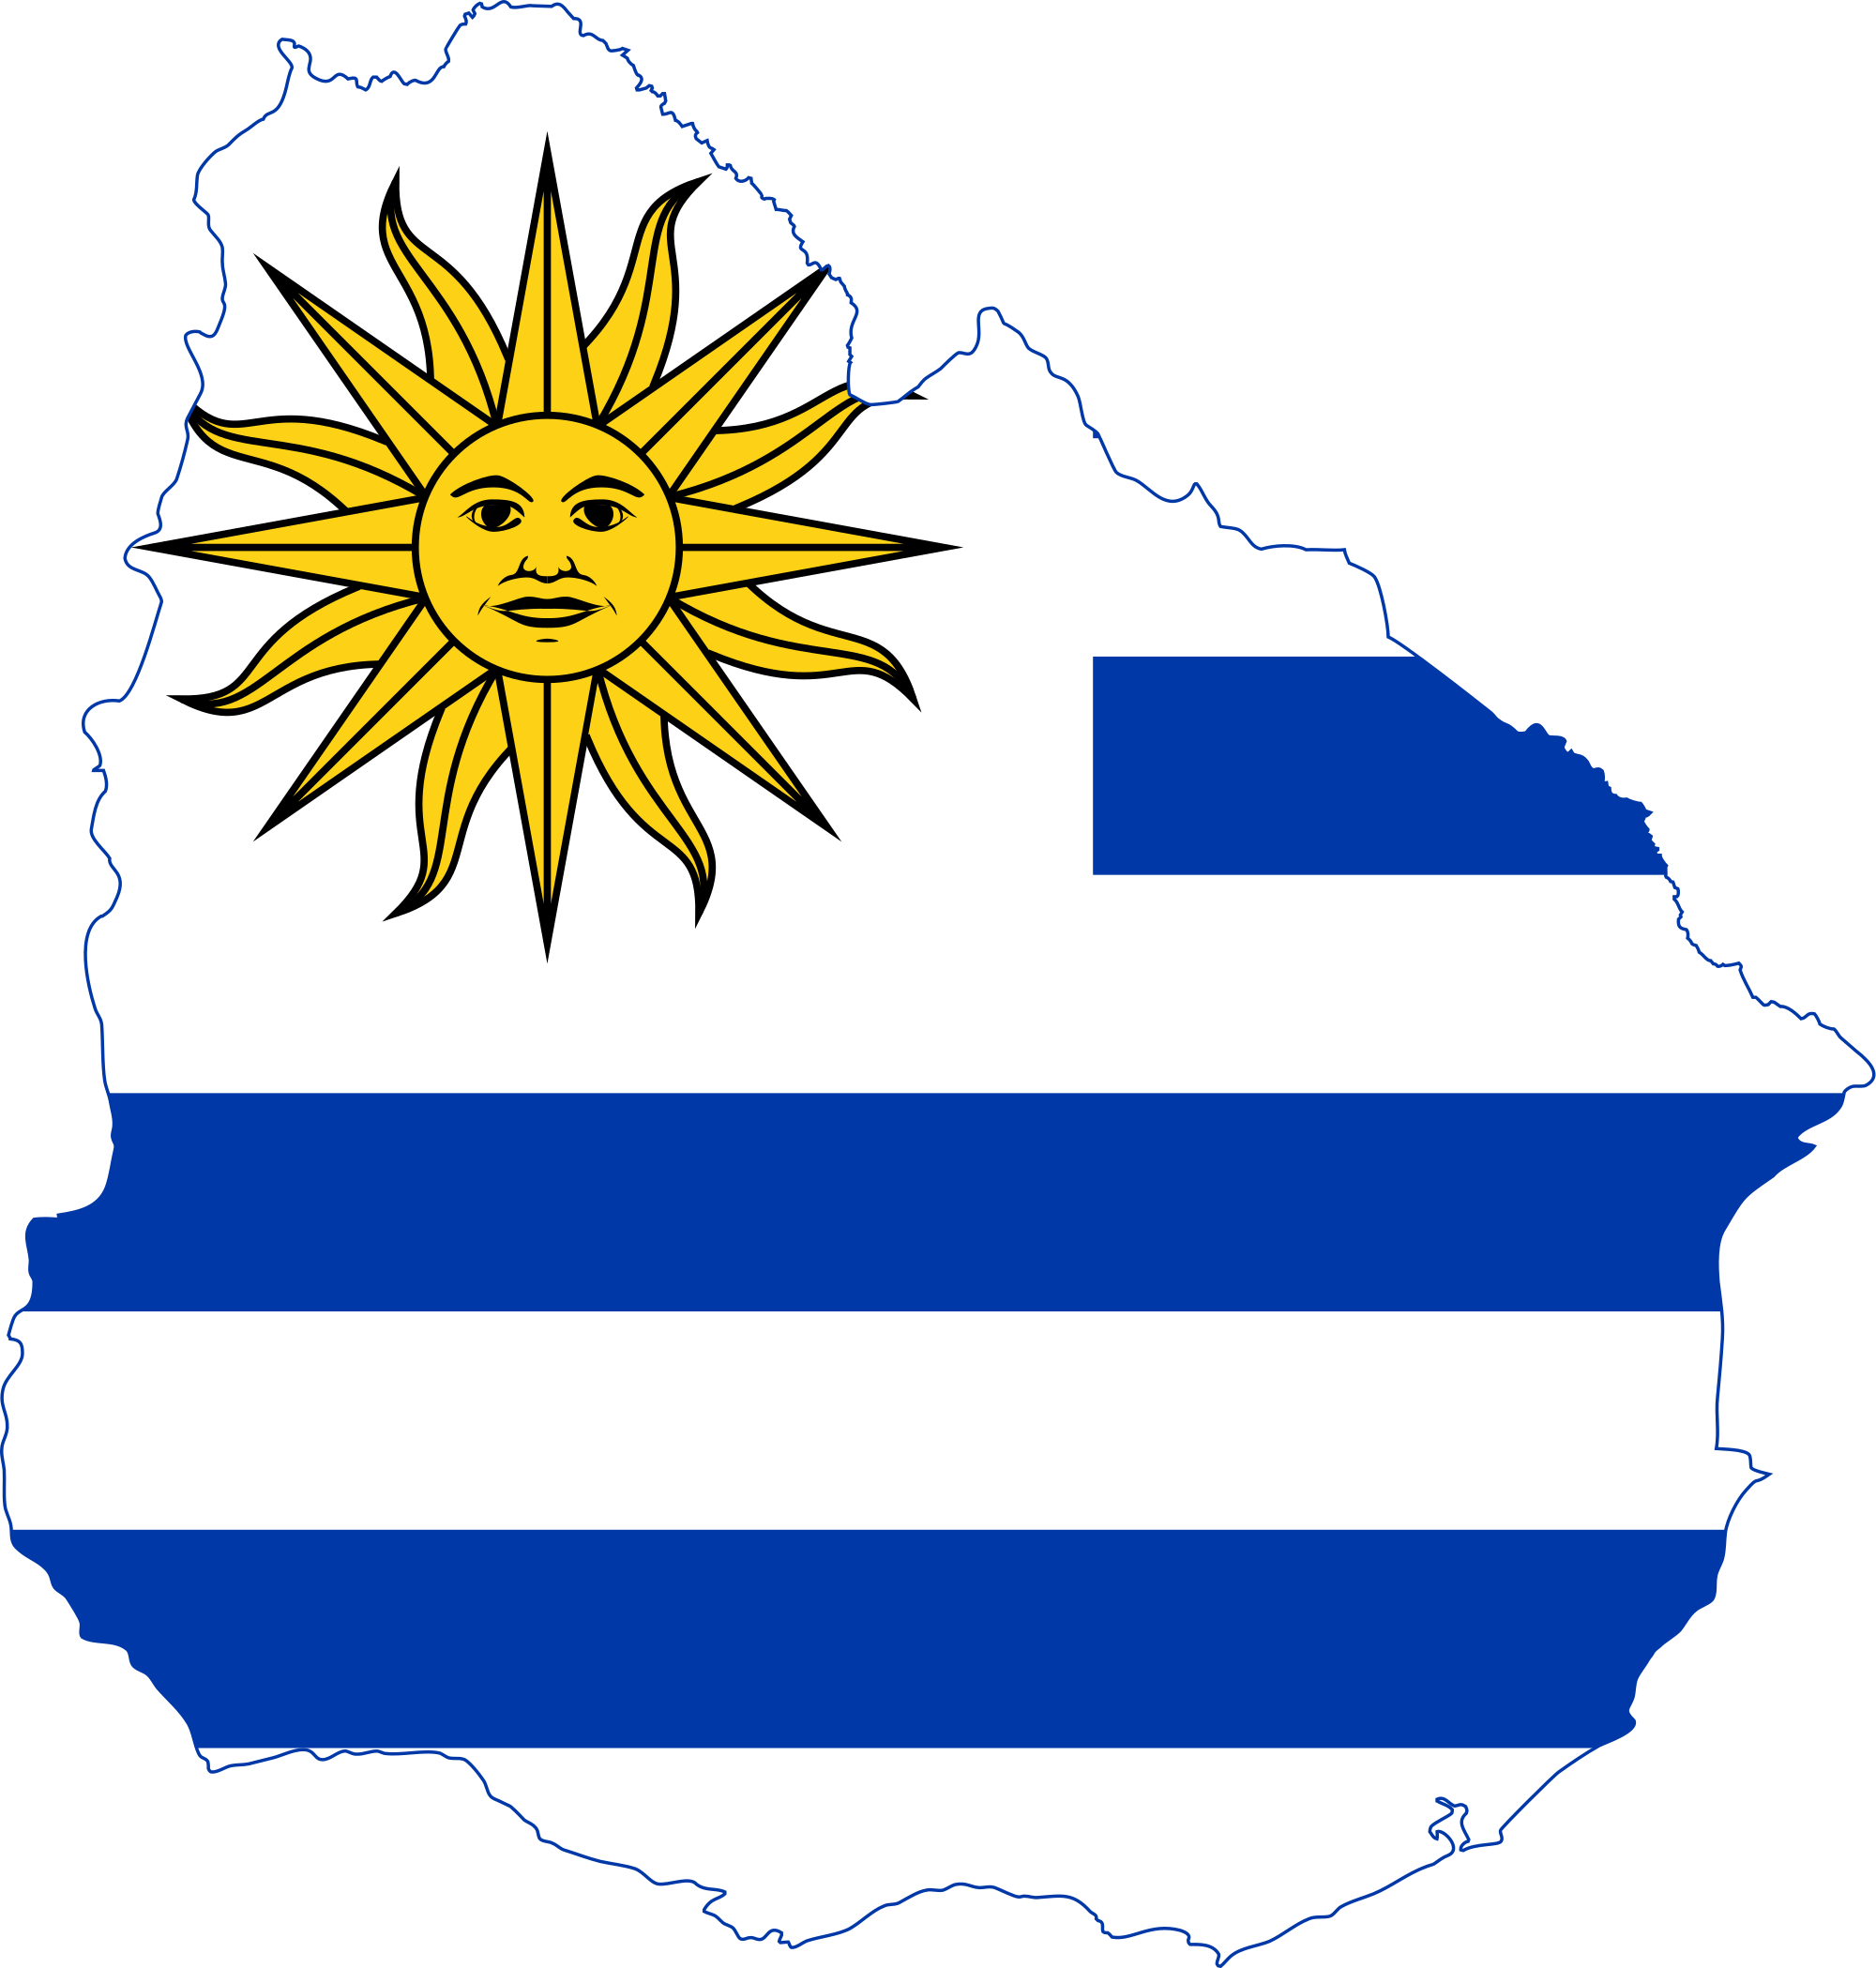 High Resolution Wallpaper   Flag Of Uruguay 2000x2098 px